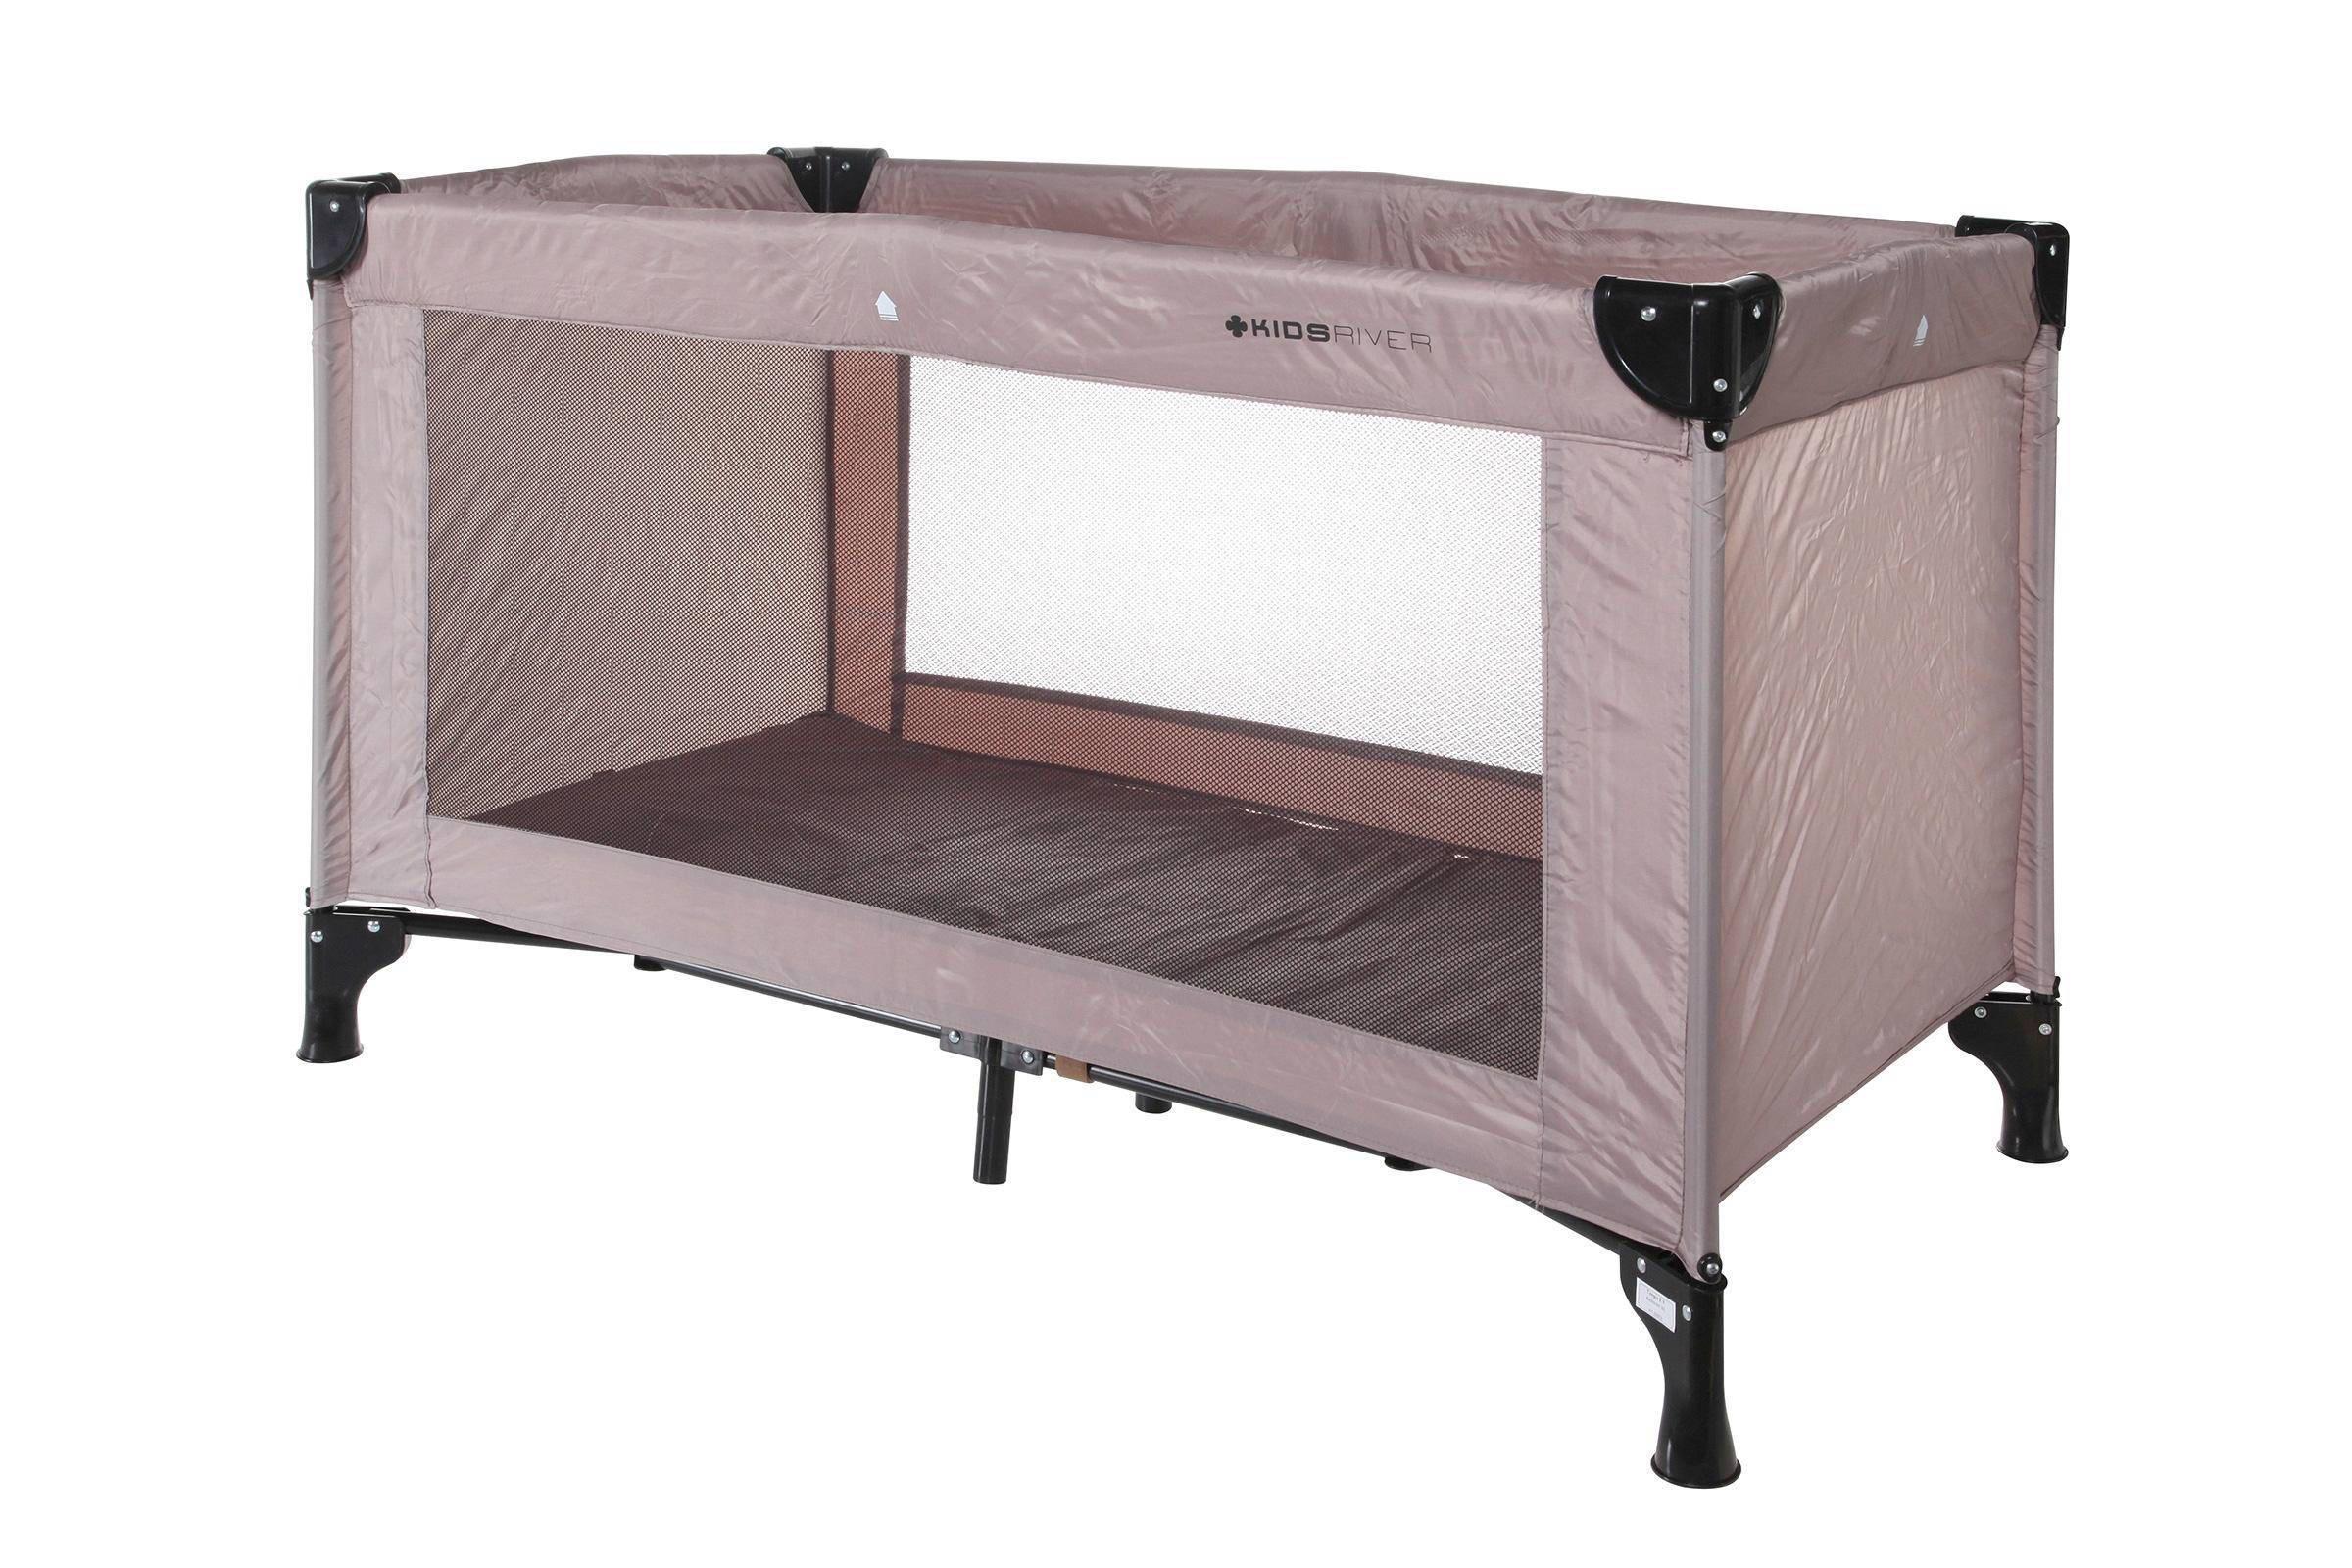 Matras Campingbedje Ikea : Ikea campingbedje picswe